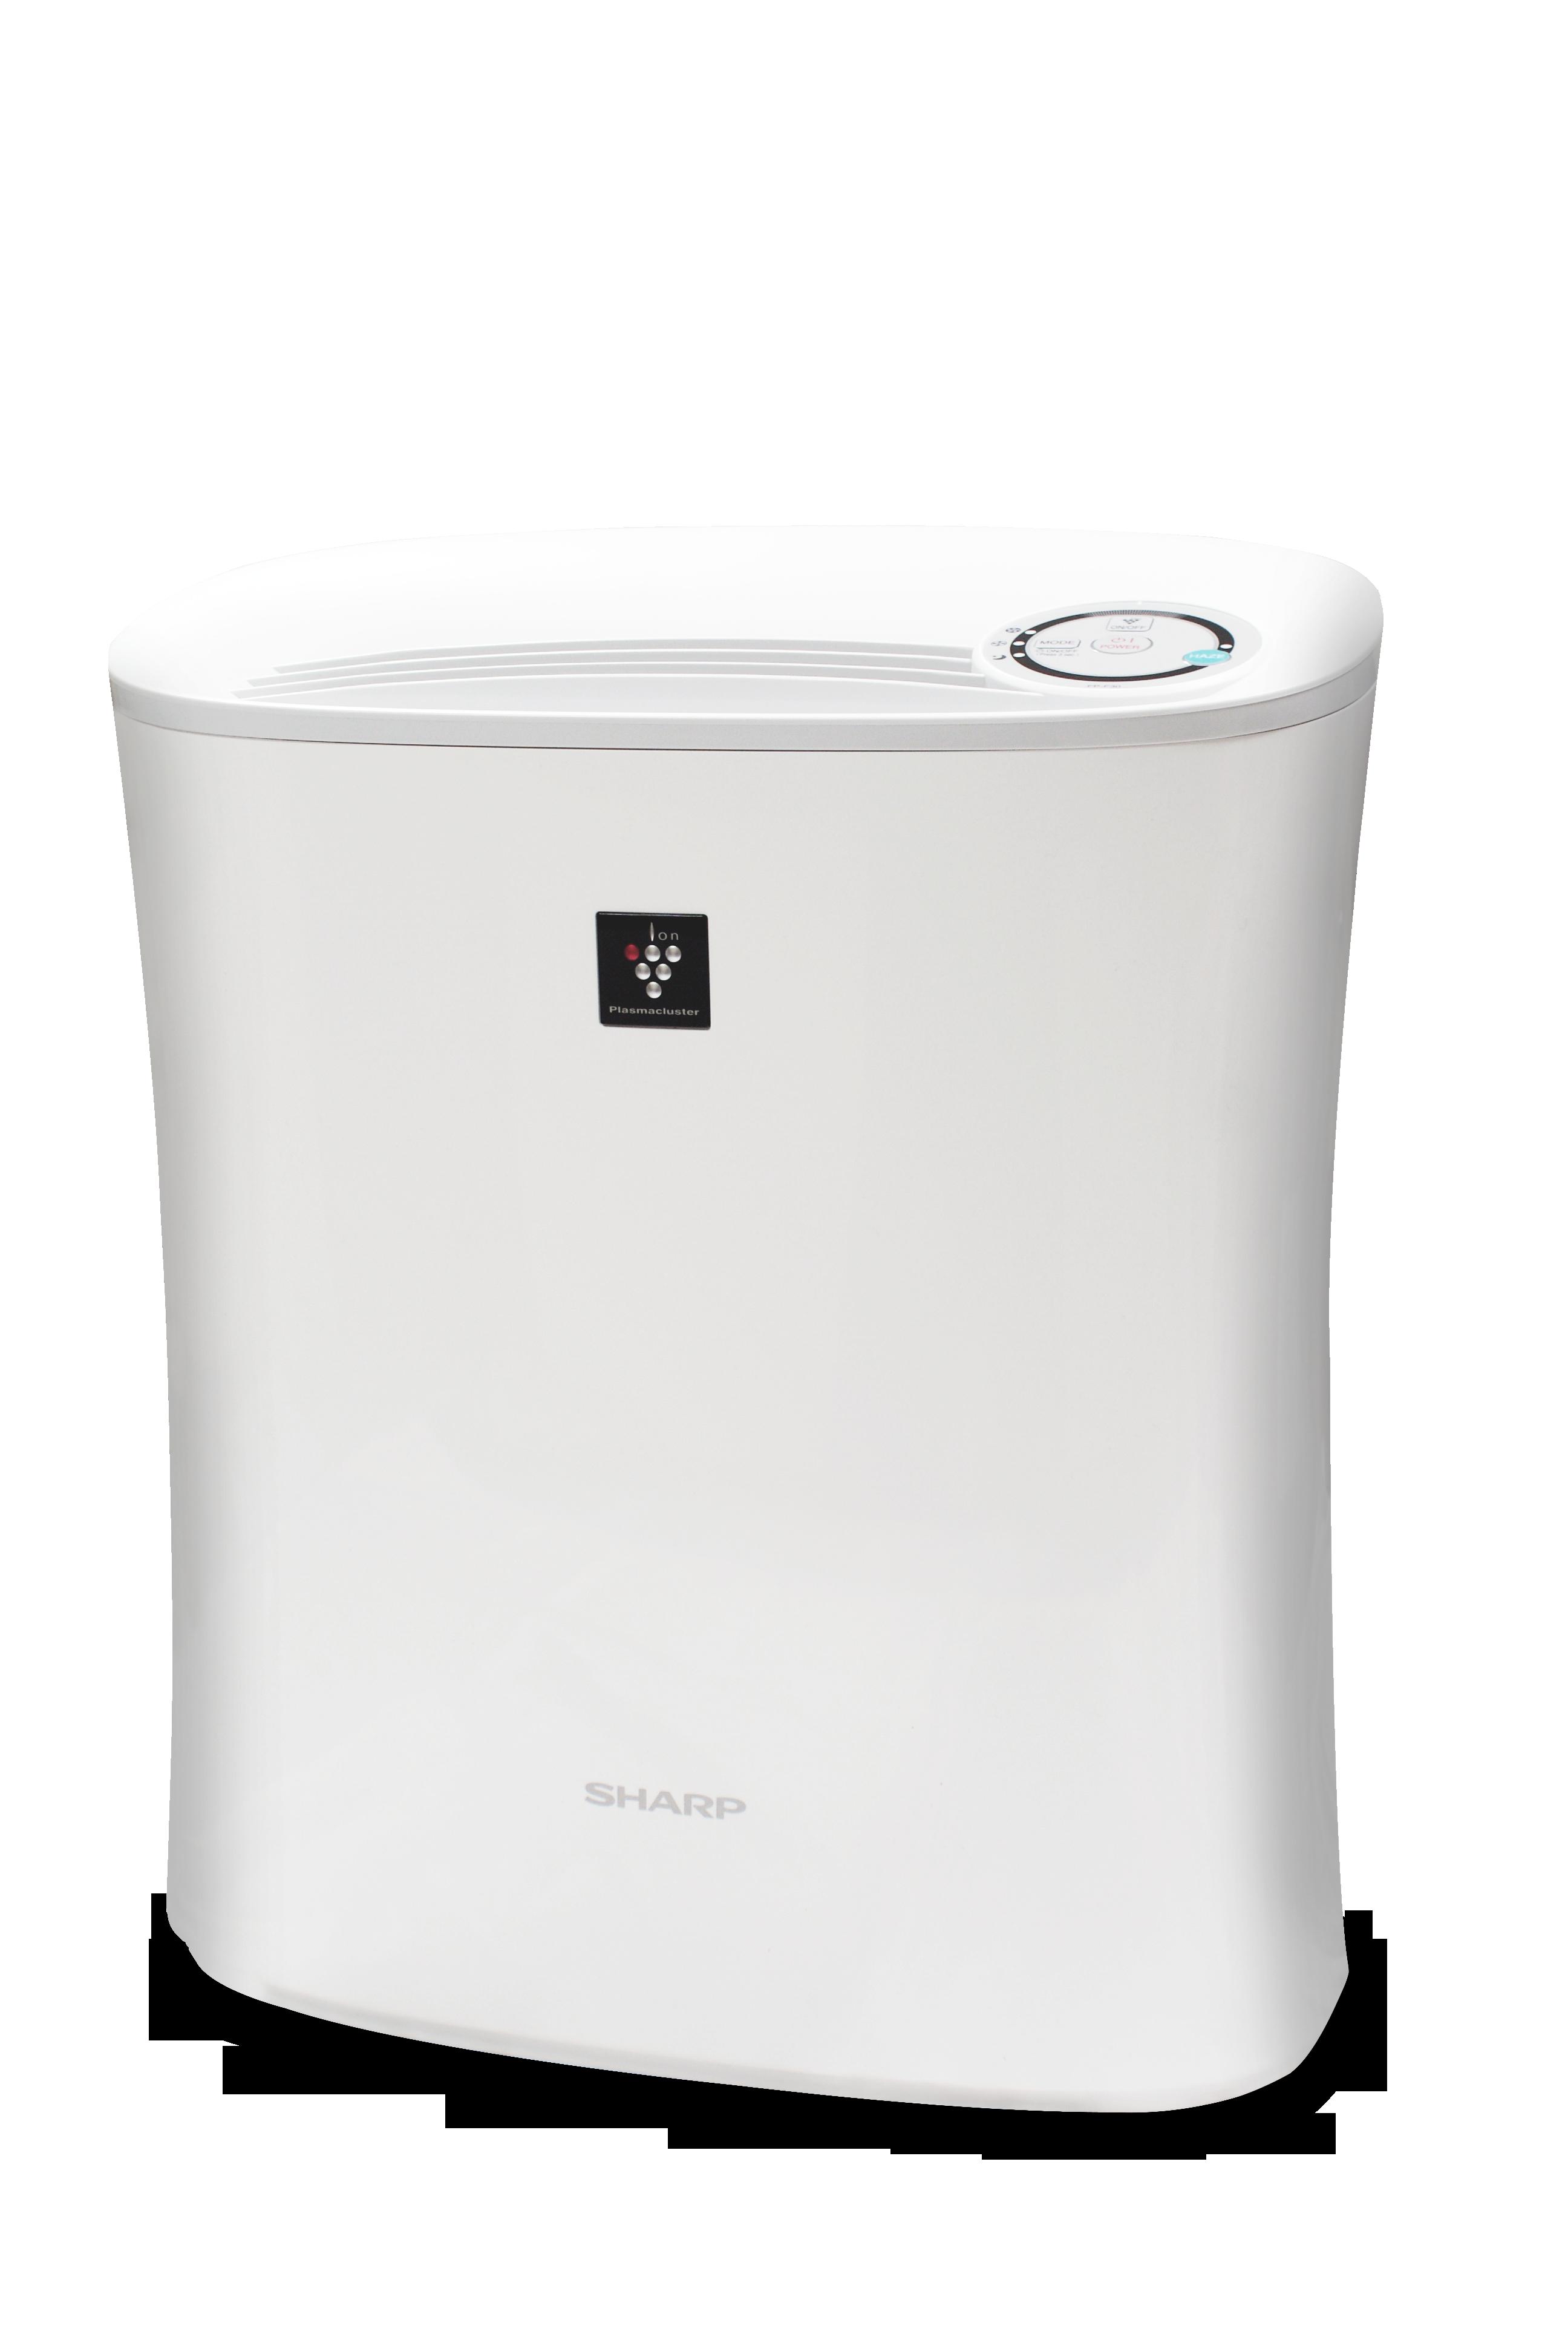 Sharp Plasmacluster Air Purifiers Proven to Improve Indoor